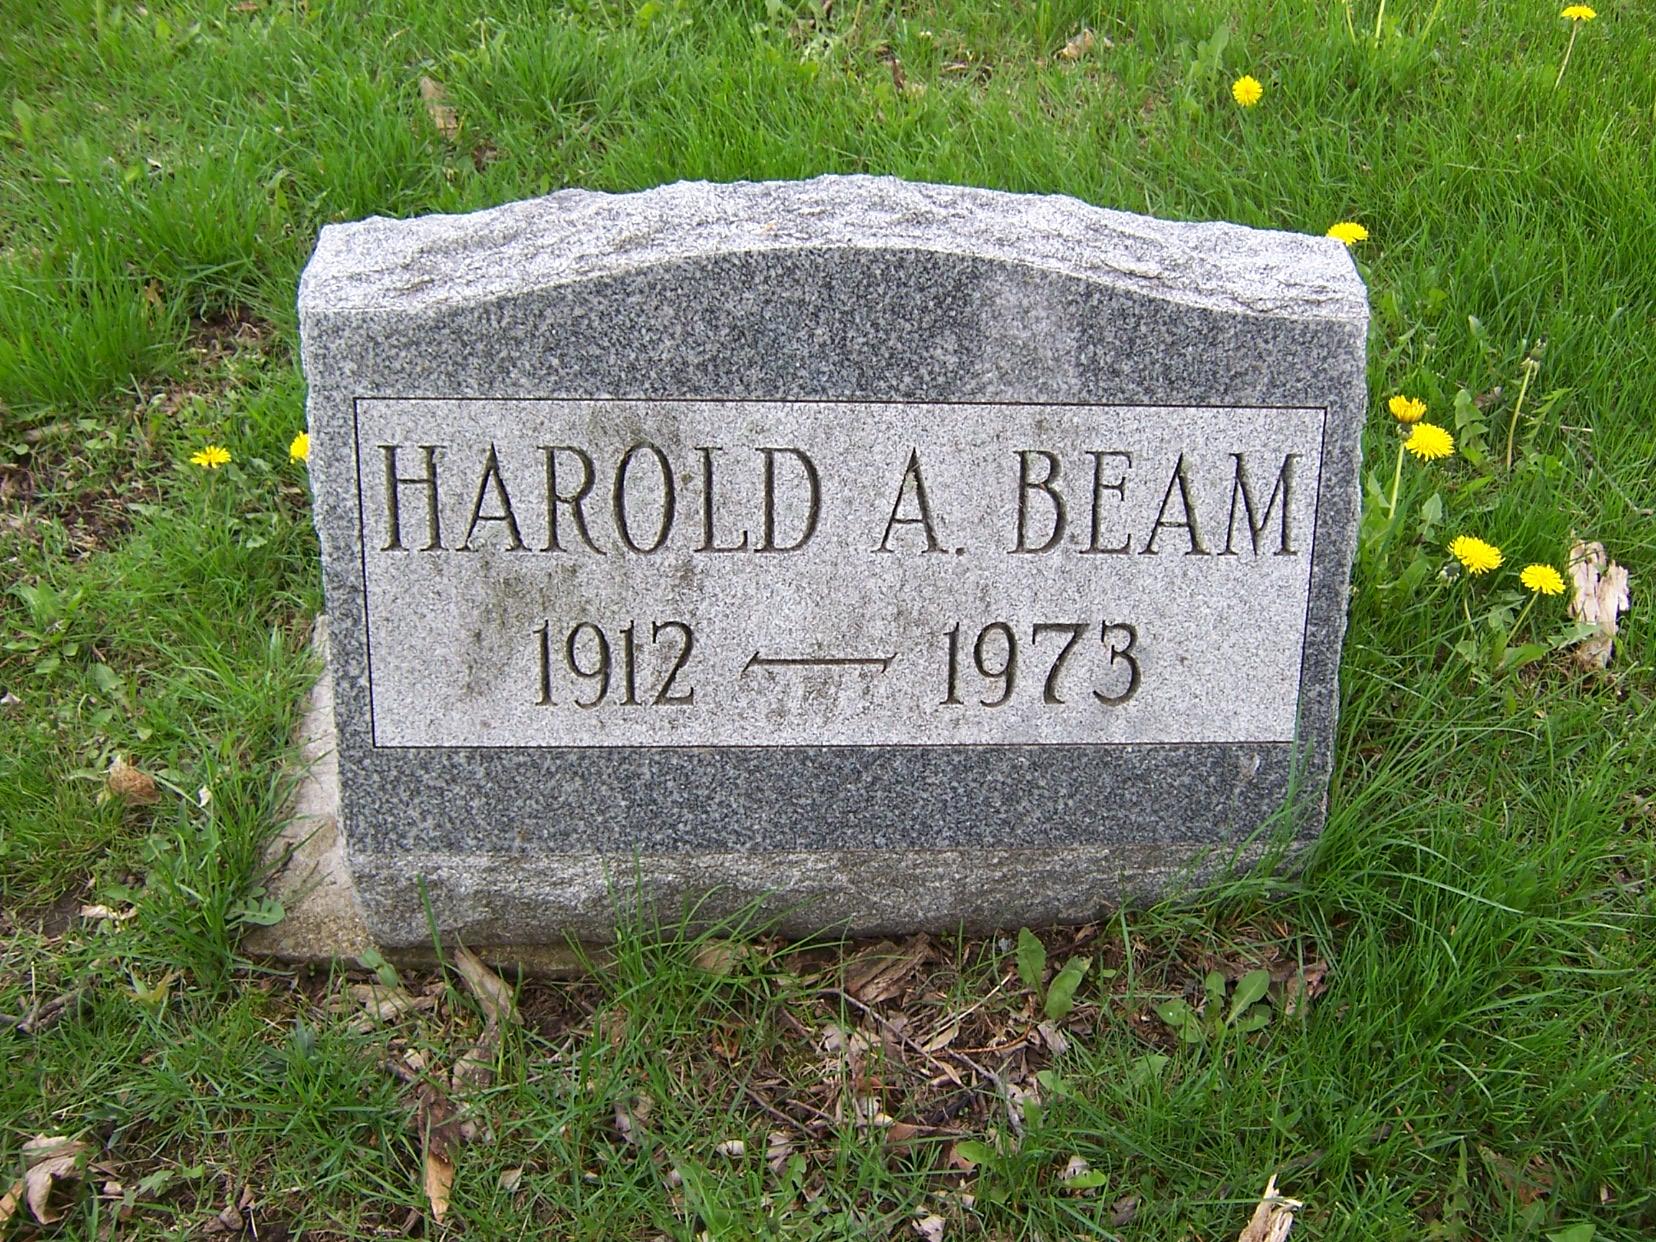 Harold A. Beam